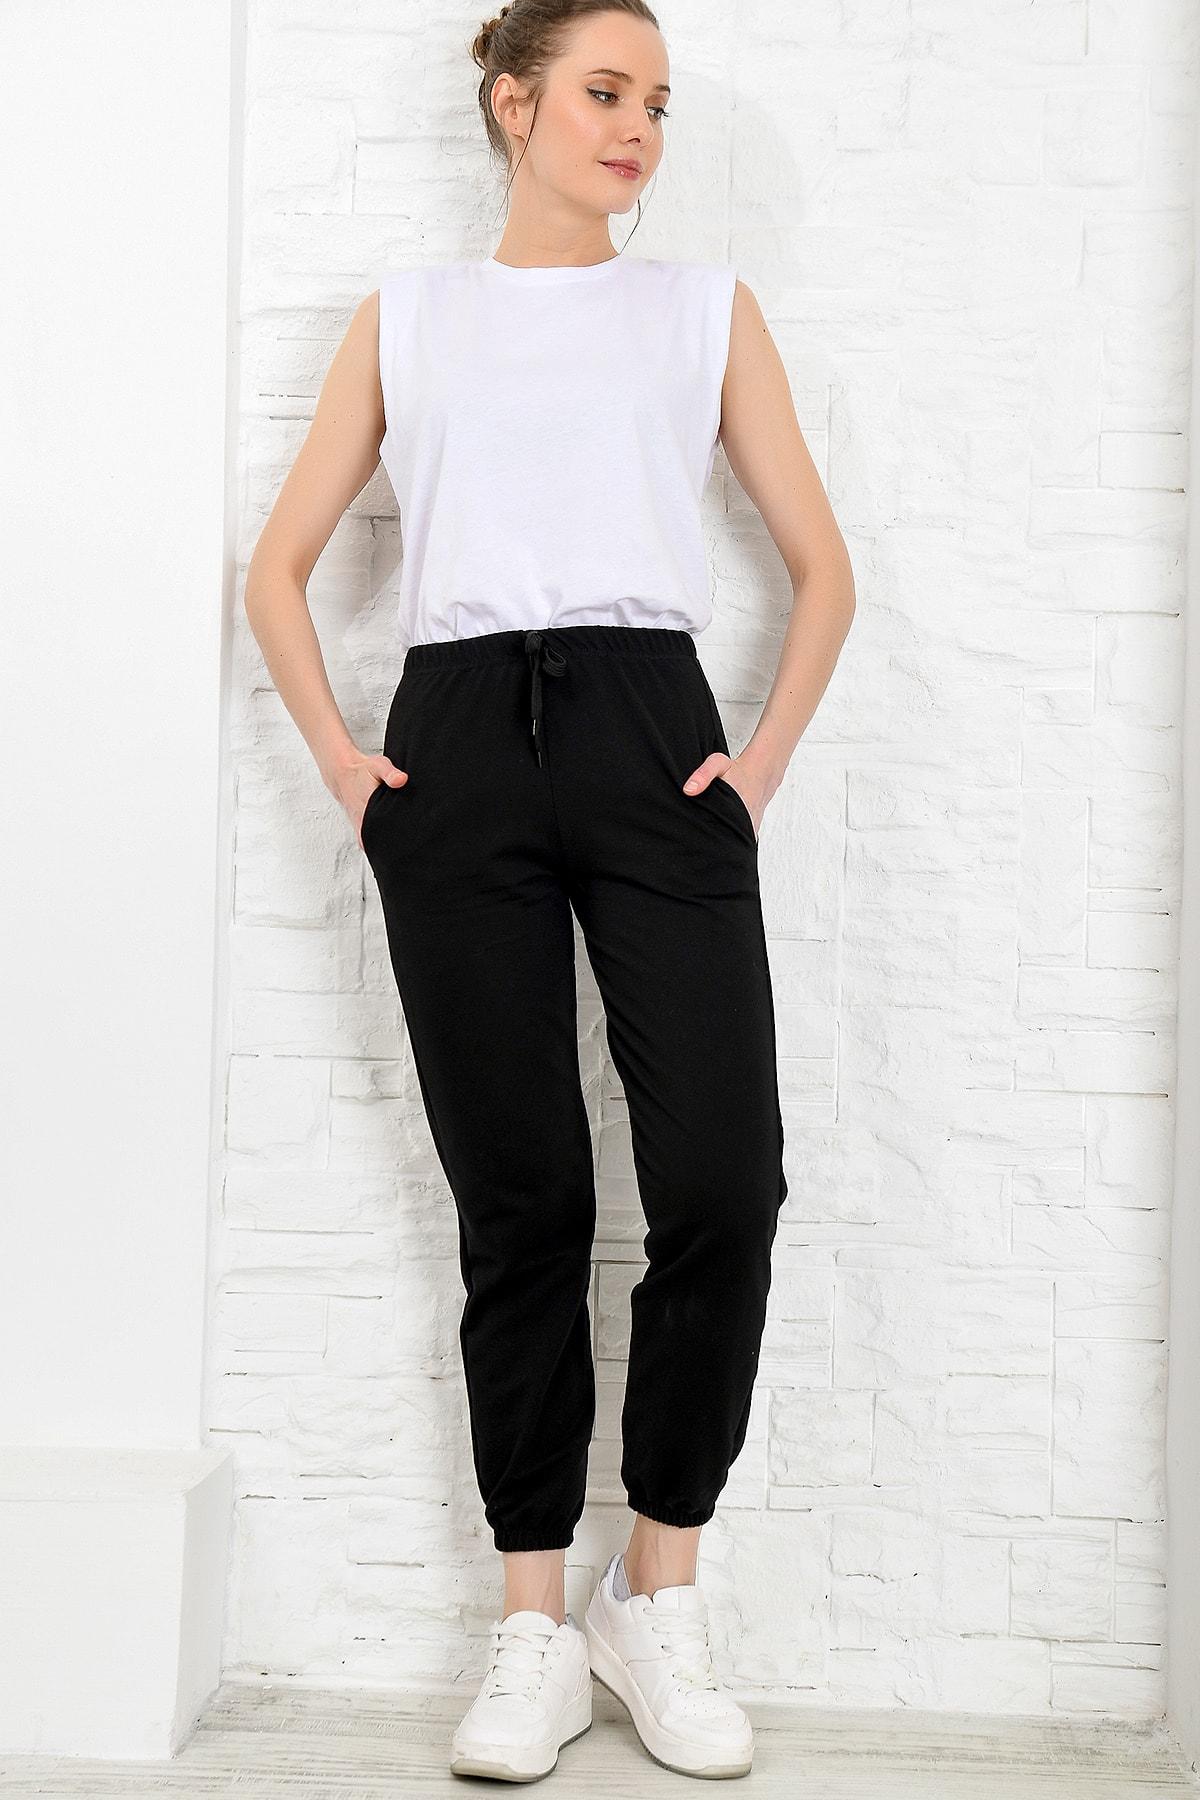 Trend Alaçatı Stili Kadın Siyah Paçası Lastikli İki İplik Eşofman Altı ALC-Y2933